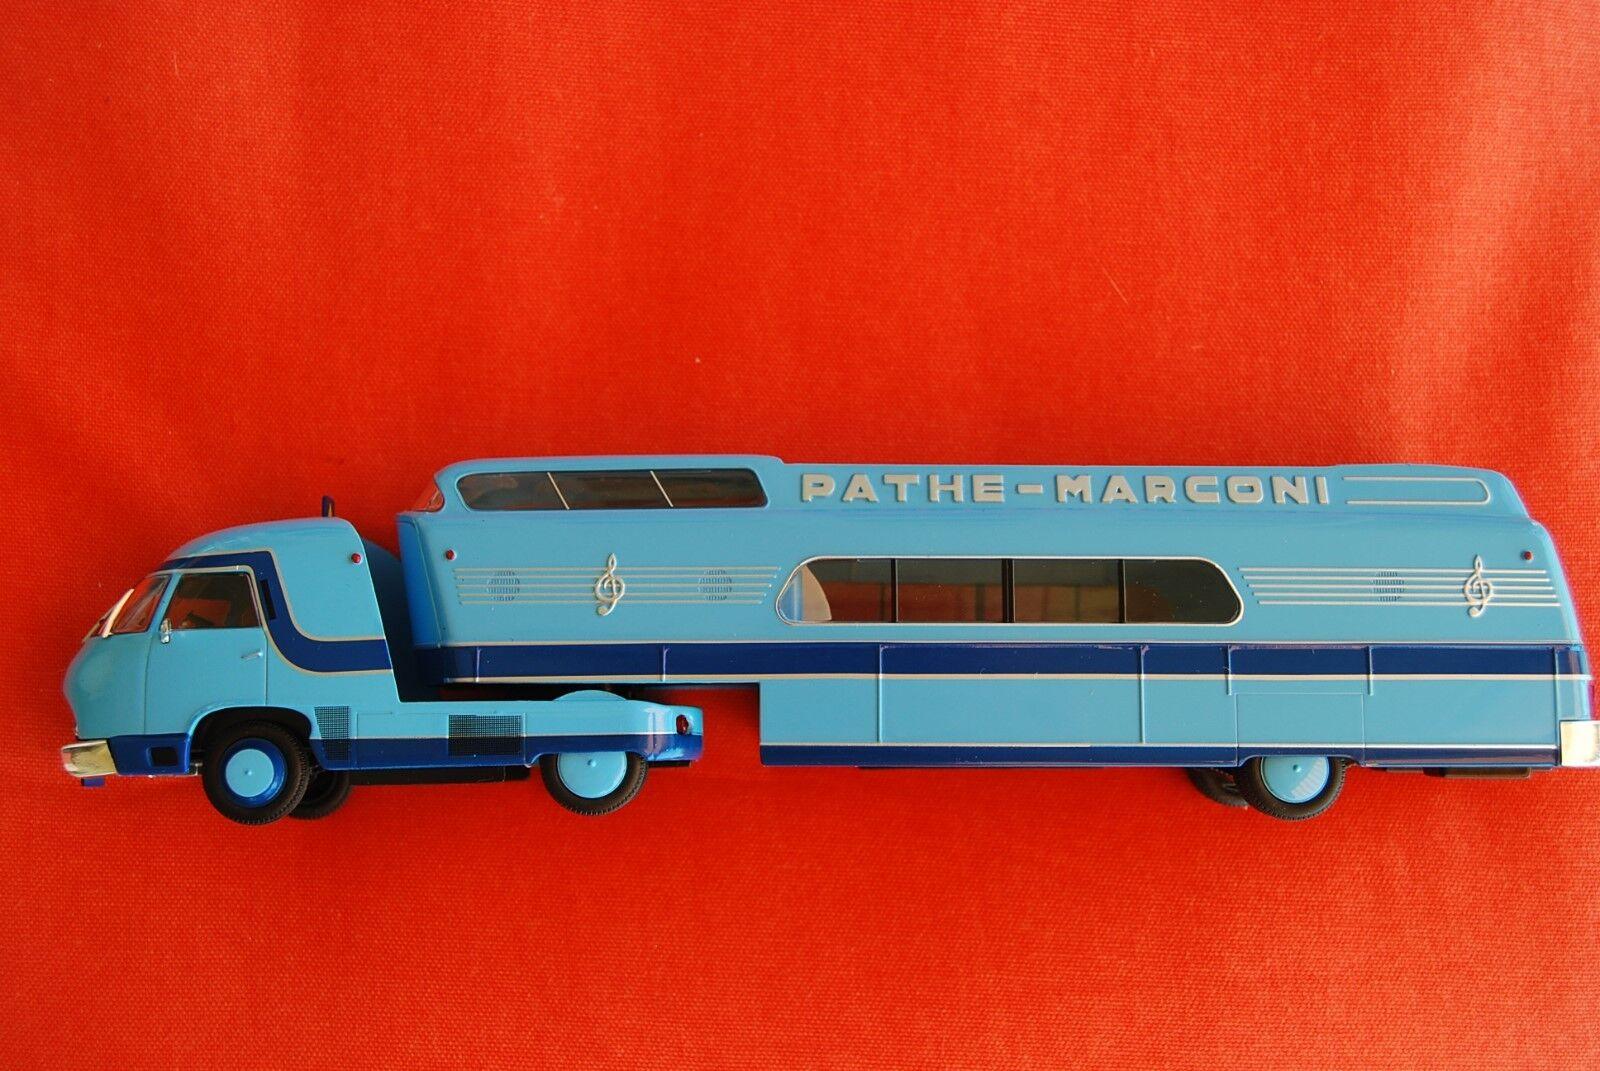 venta de ofertas Ixo Ixo Ixo 1 43 - Panhard Titan Pathe Marconi ( súperbus )Tour de France 1953  nuevo listado